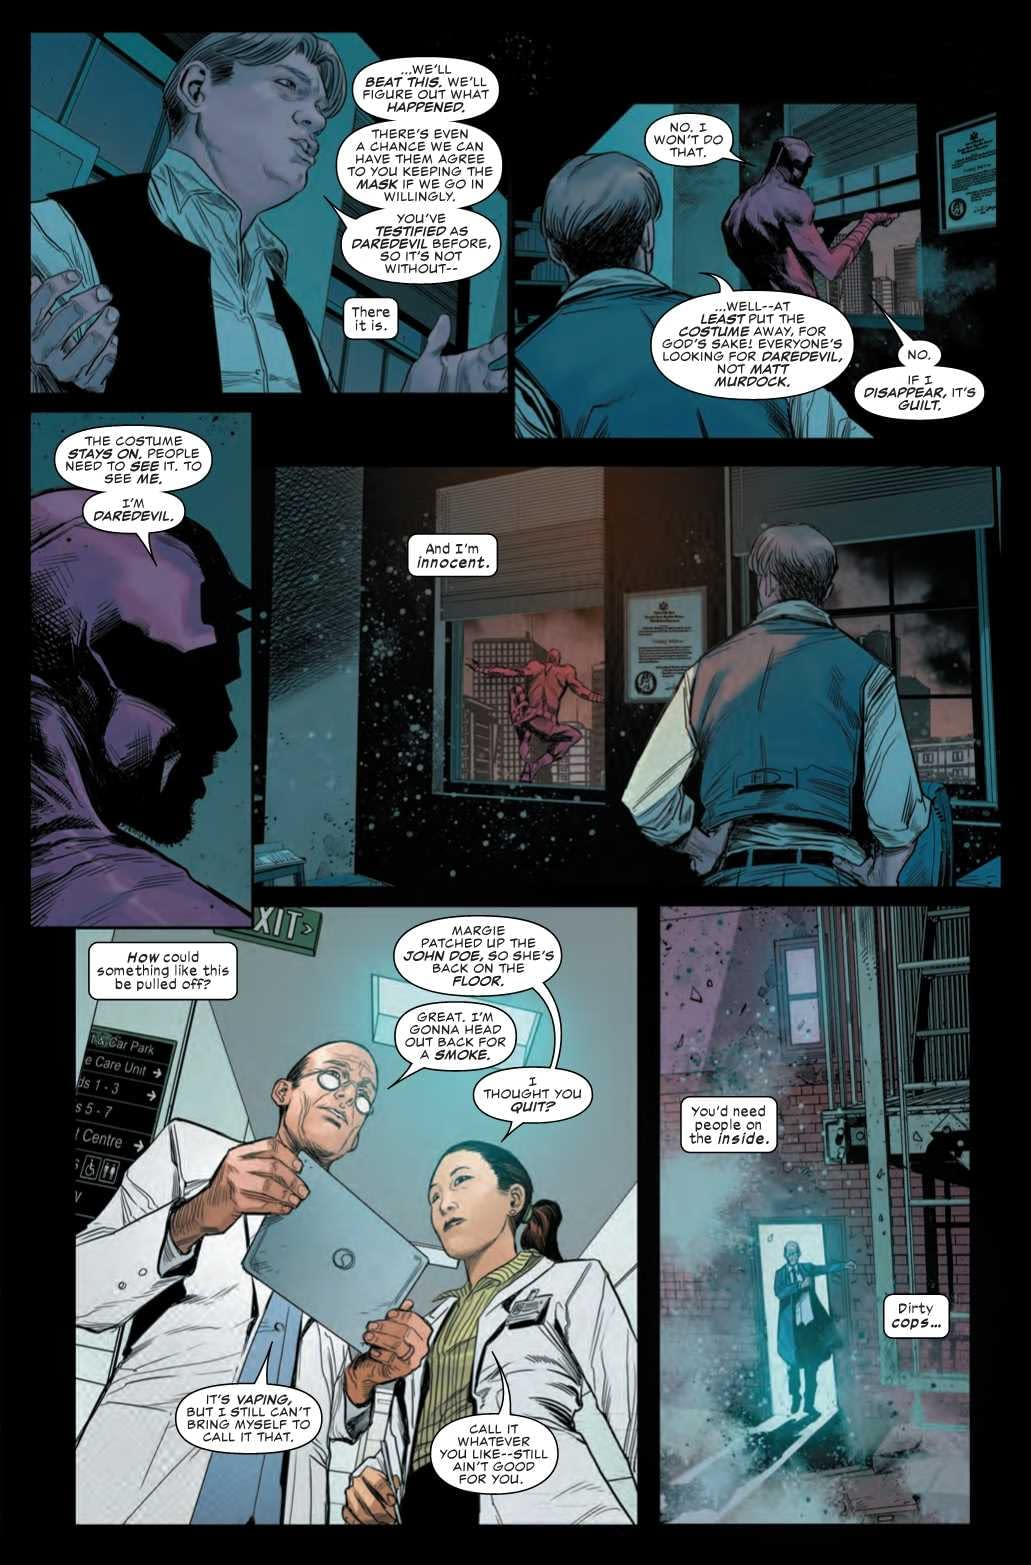 Next Week's Daredevil #2 Tries to Bring Smoking Back to Marvel Comics